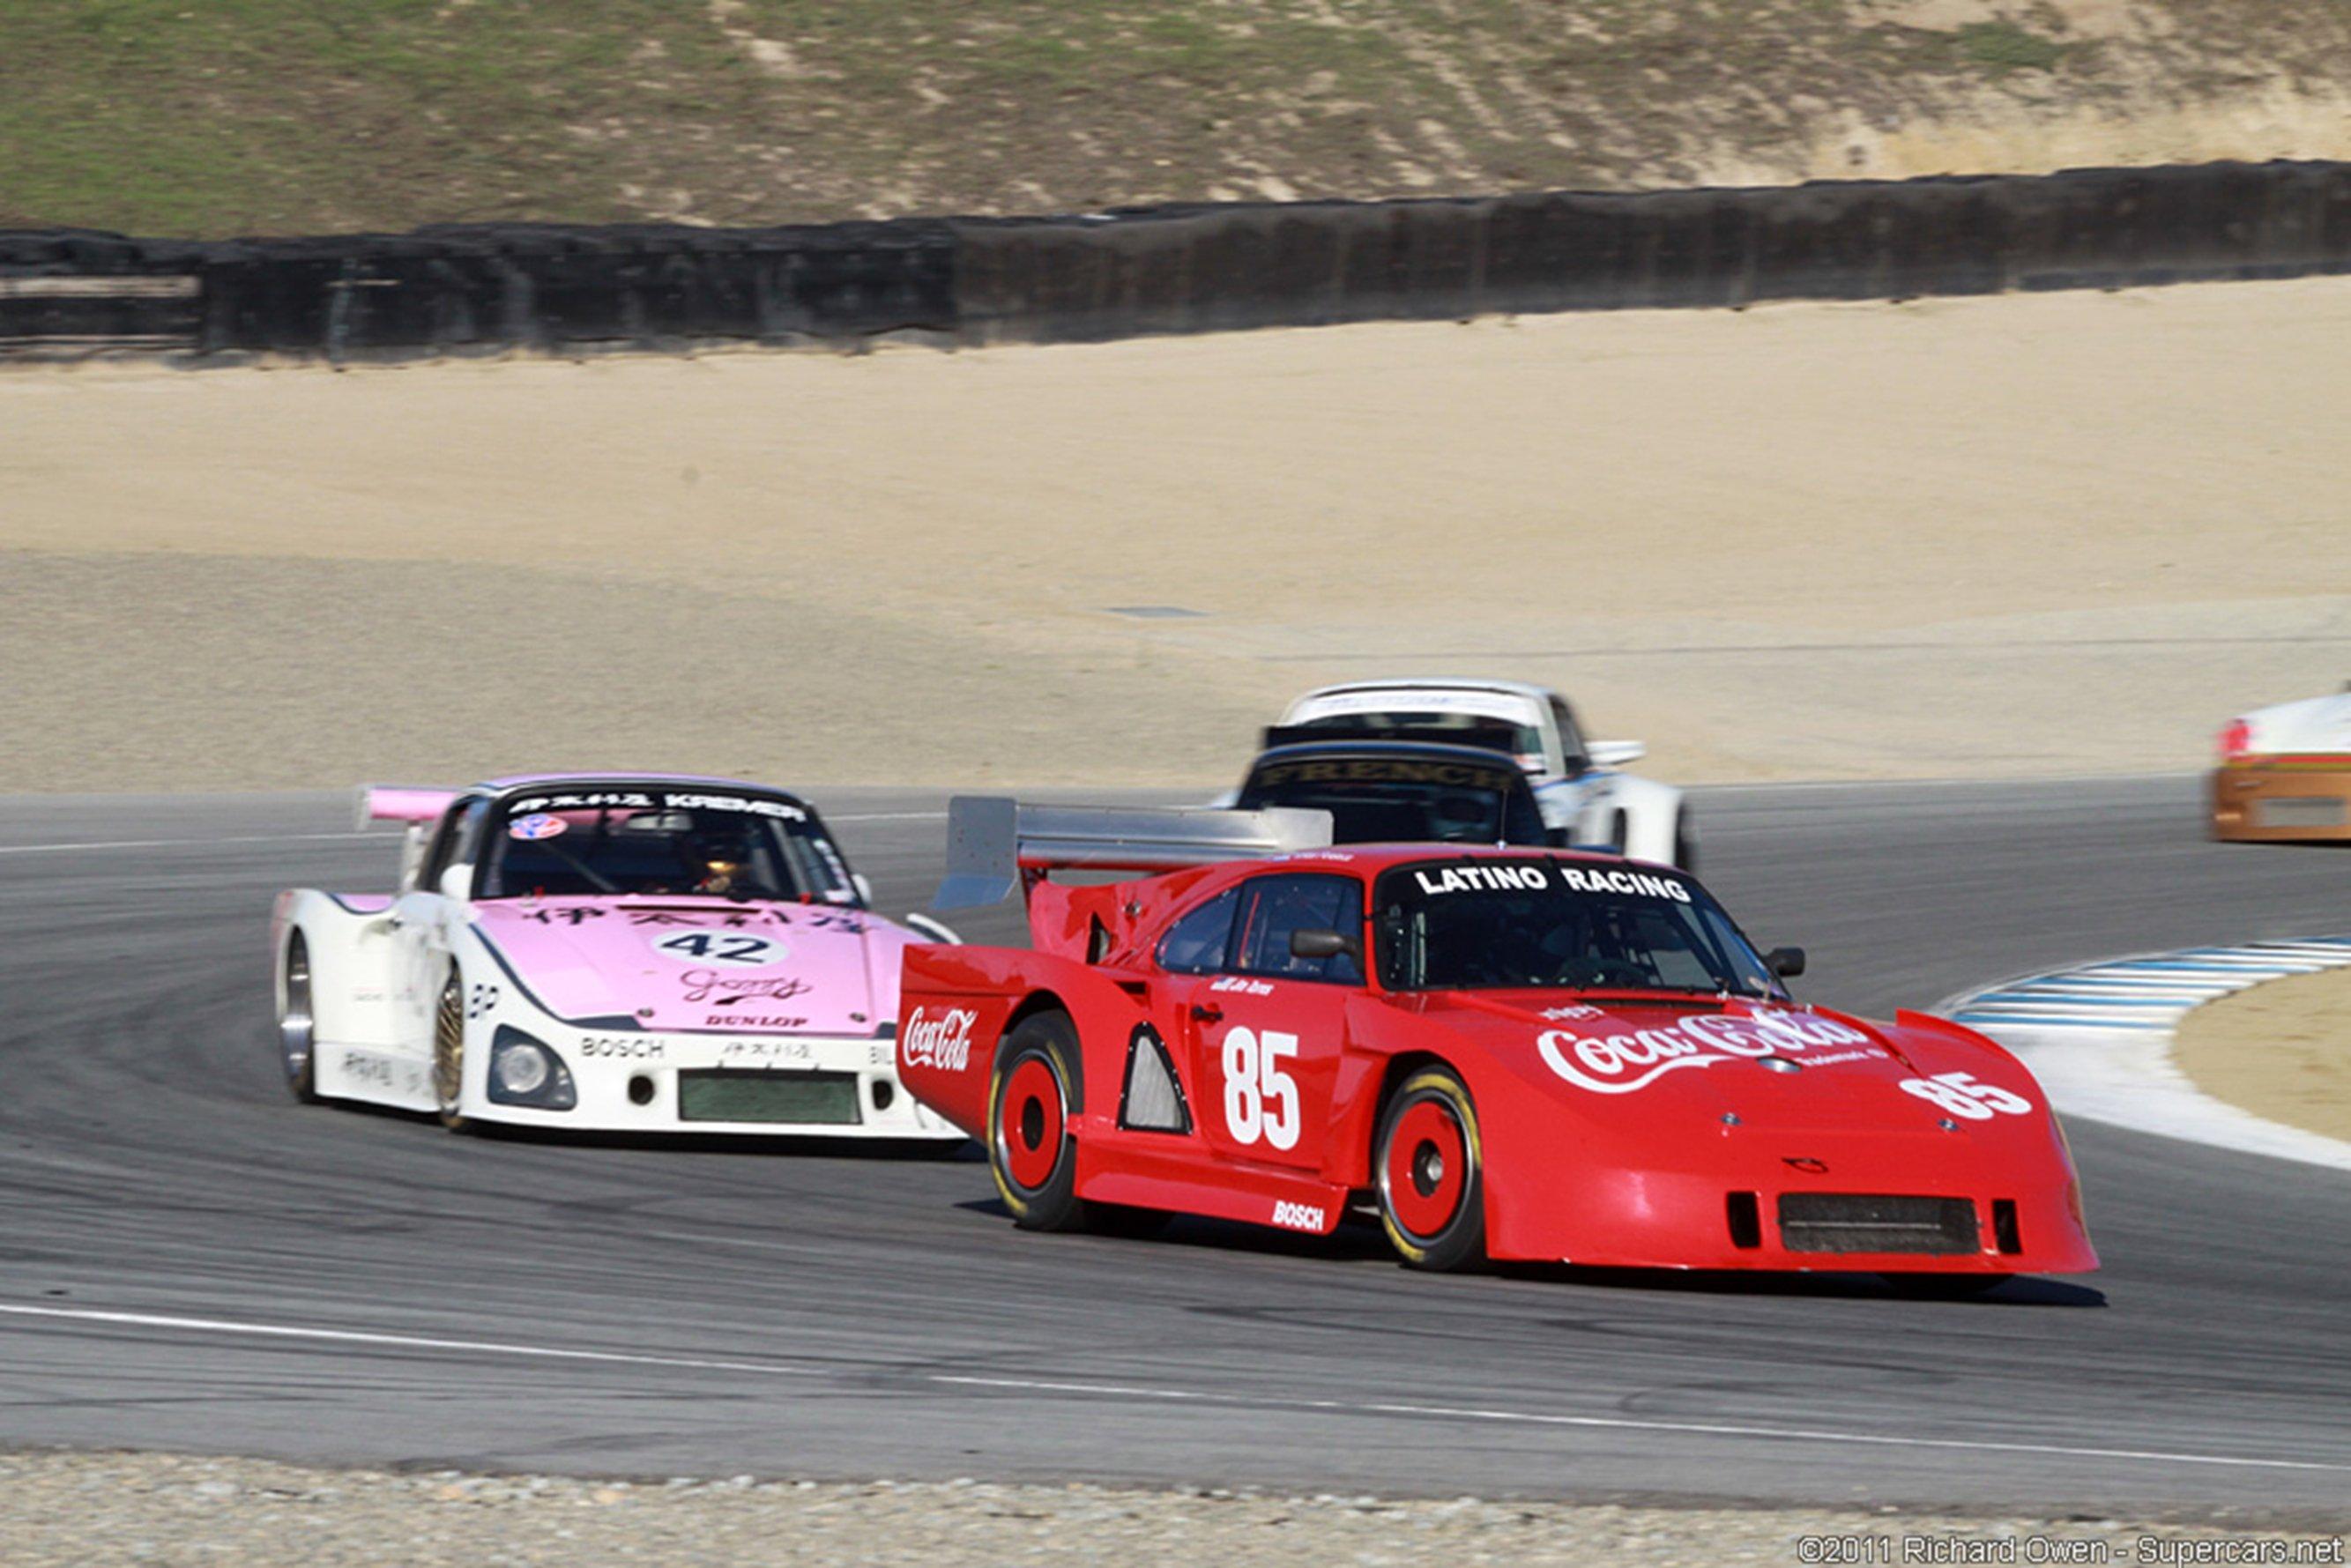 Race Car Classic Racing Porsche Germany 2667x1779 Coca